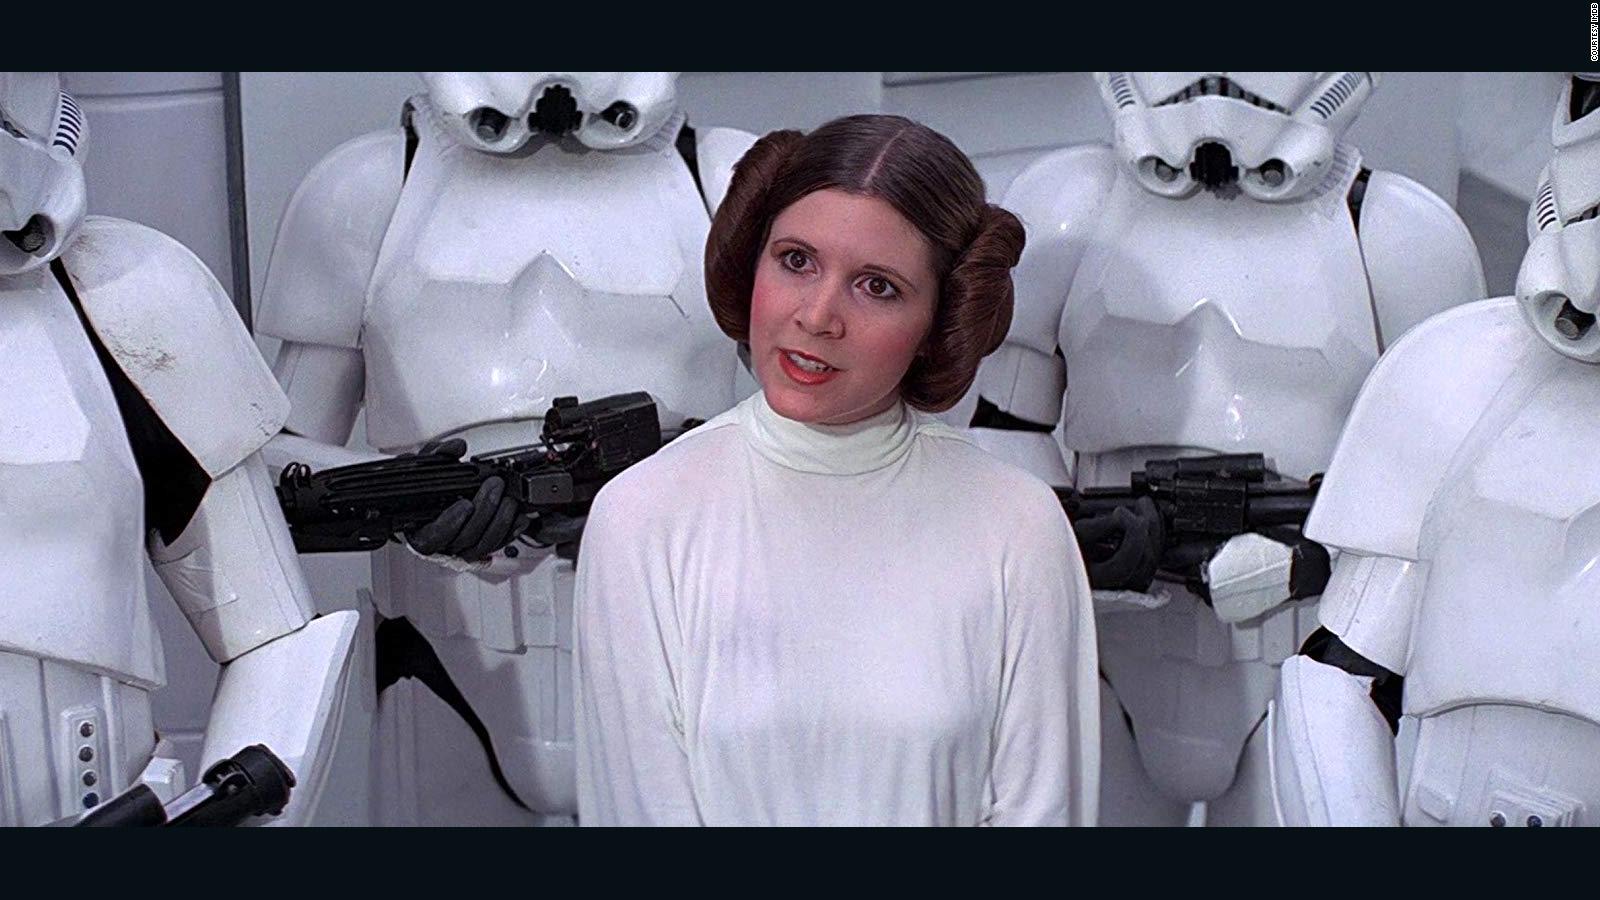 Princess Leia Wallpaper 1600x900 Download Hd Wallpaper Wallpapertip